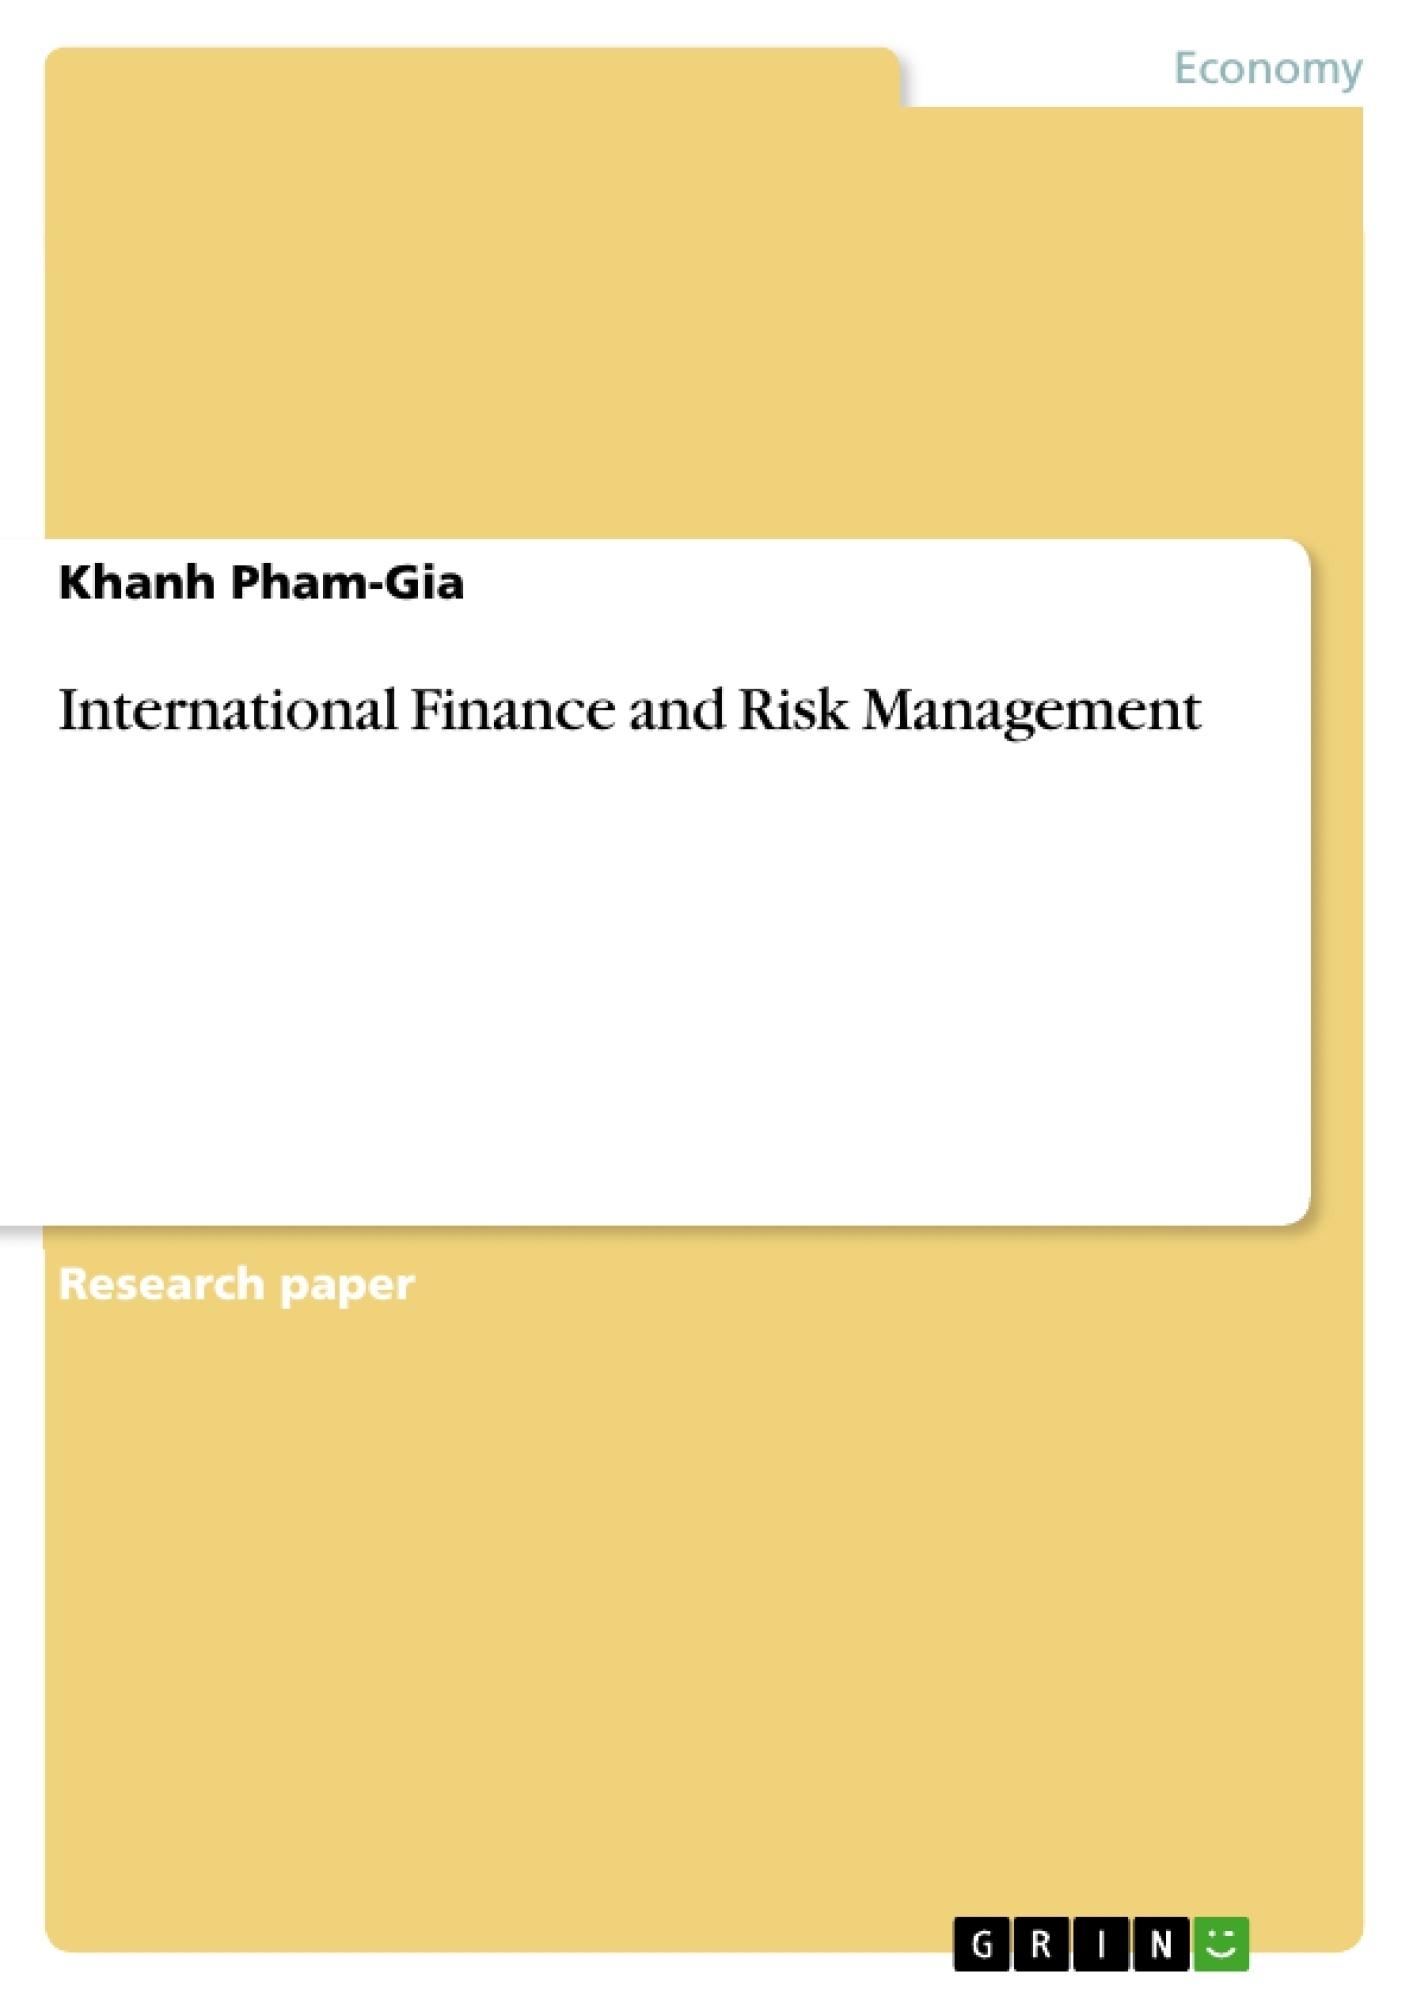 Title: International Finance and Risk Management